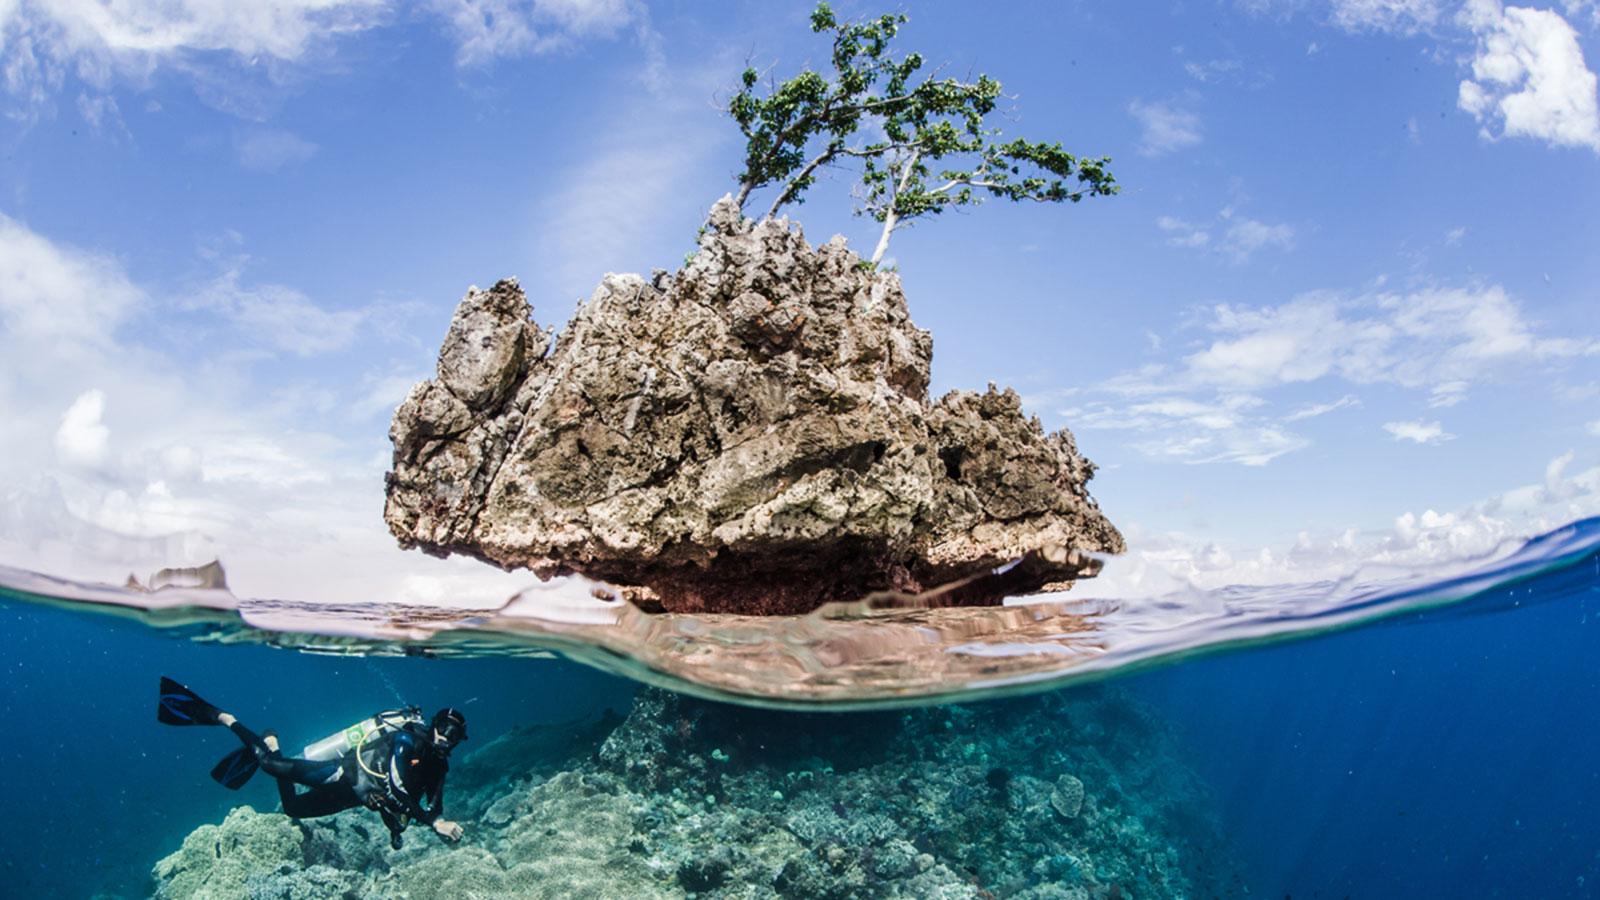 Luxury Dive Resorts 10 Of The World S Best Cnn Travel